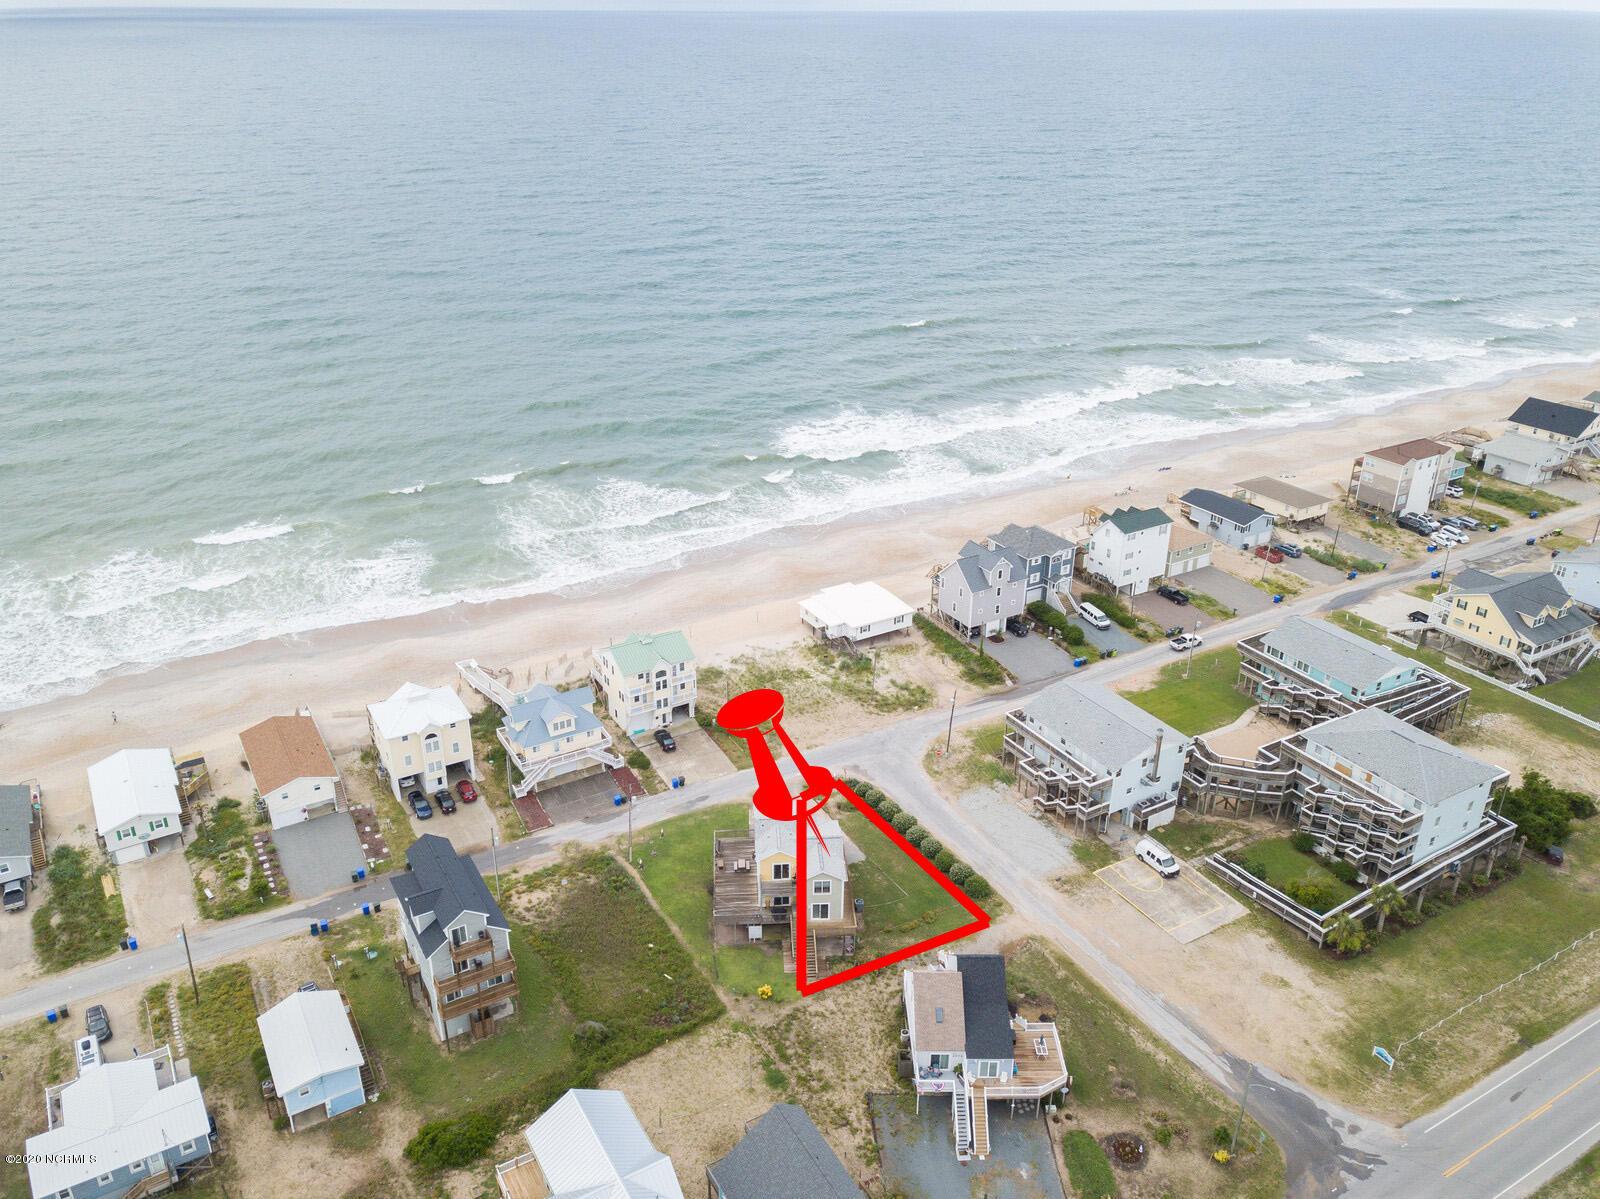 283 Seashore Drive, North Topsail Beach, North Carolina 28460, 3 Bedrooms Bedrooms, ,2 BathroomsBathrooms,Residential,For Sale,Seashore,100226933